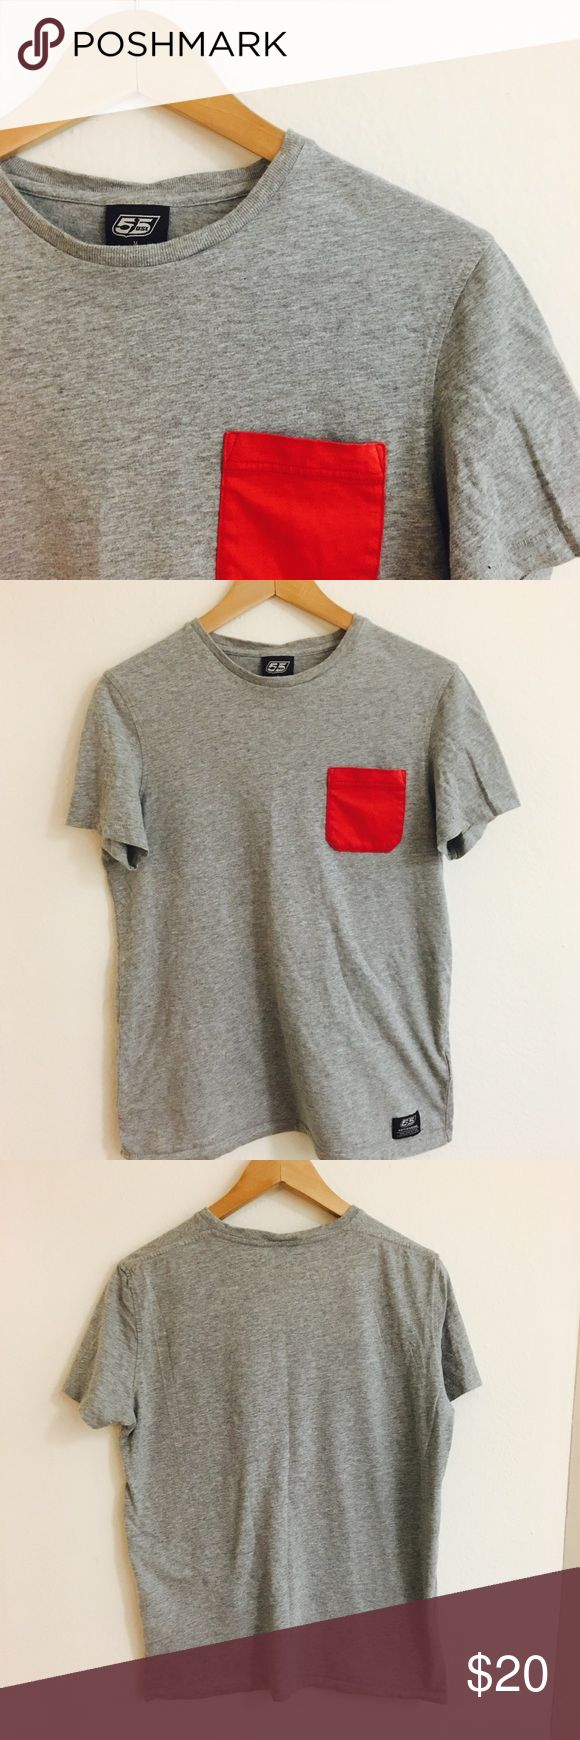 Mens Diesel t-shirt Red pocket. 100% cotton. Gently worn. Diesel Shirts Tees - Short Sleeve